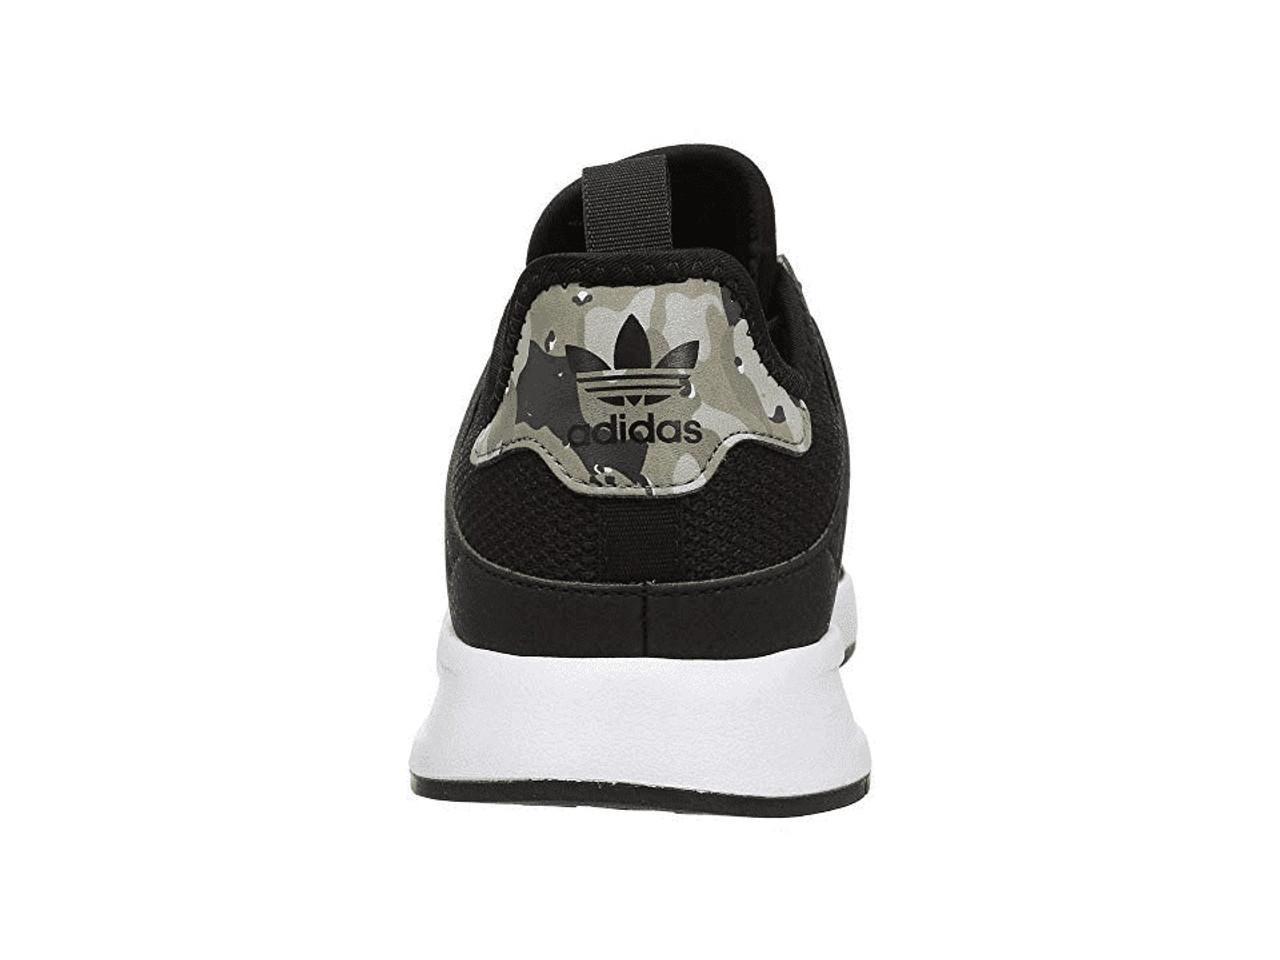 Adidas X PLR Shoes Black White Camo